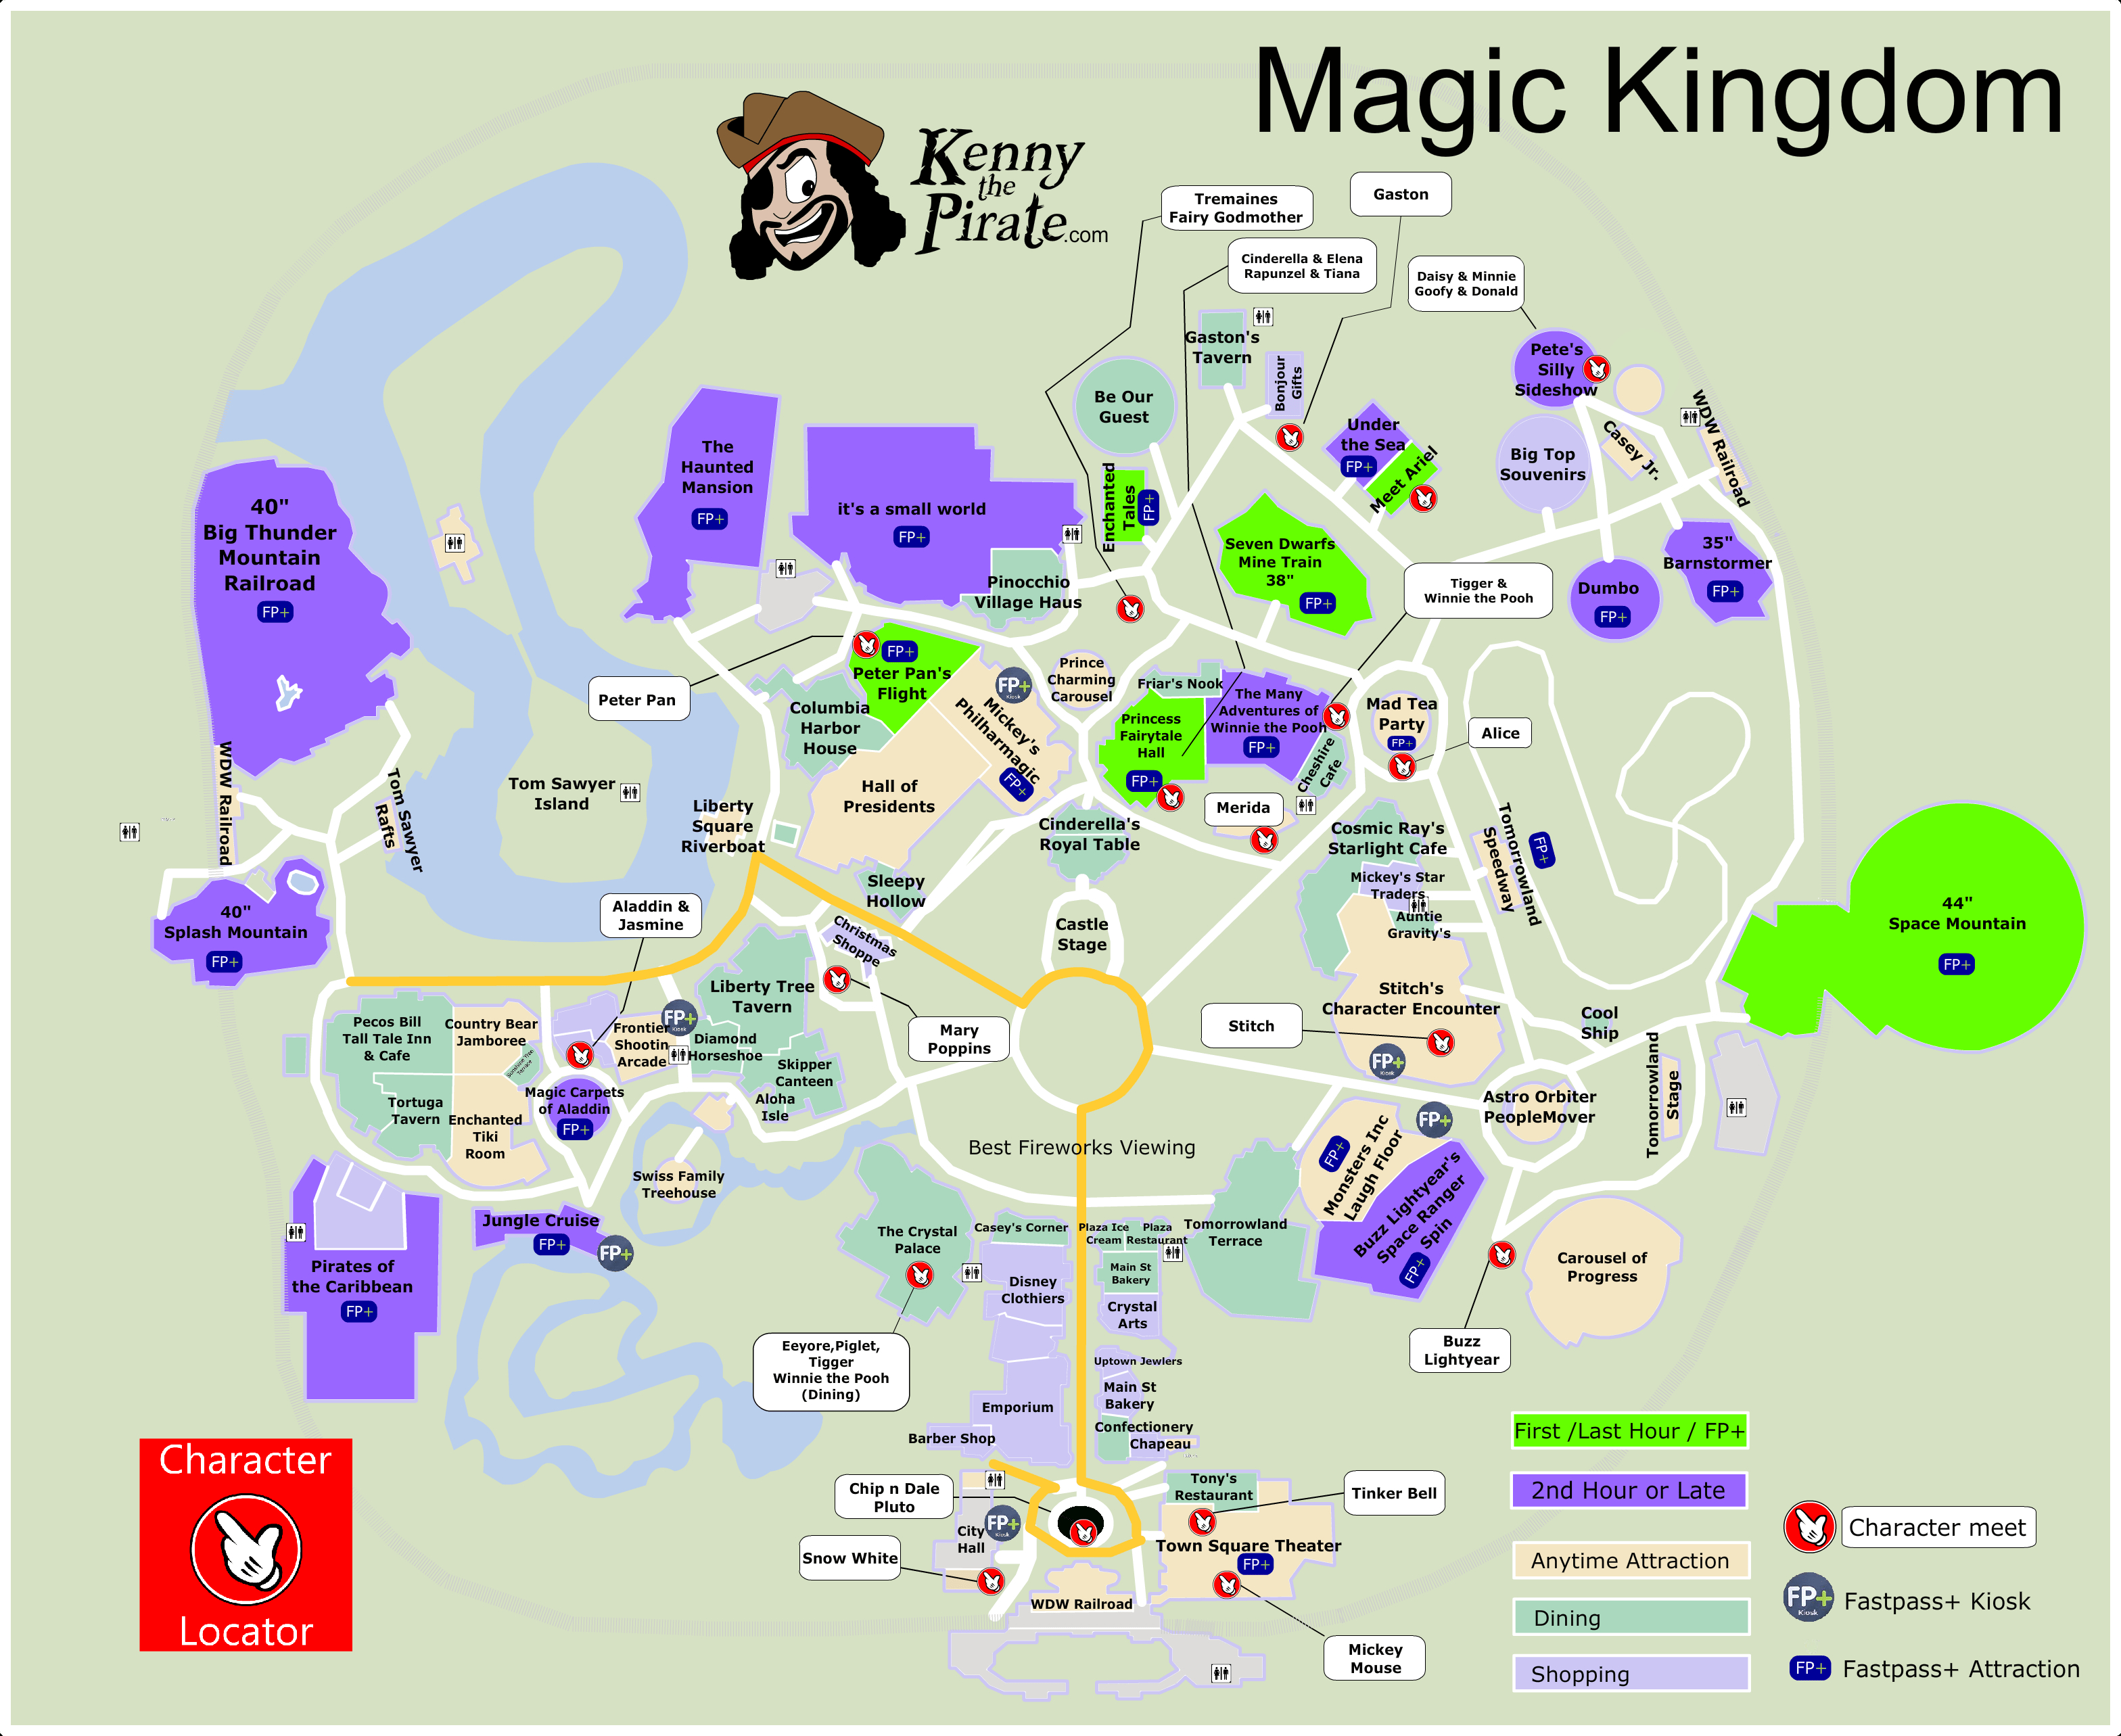 Disney World Magic Kingdom Map - Sportpicks - Map Of Magic Kingdom Orlando Florida